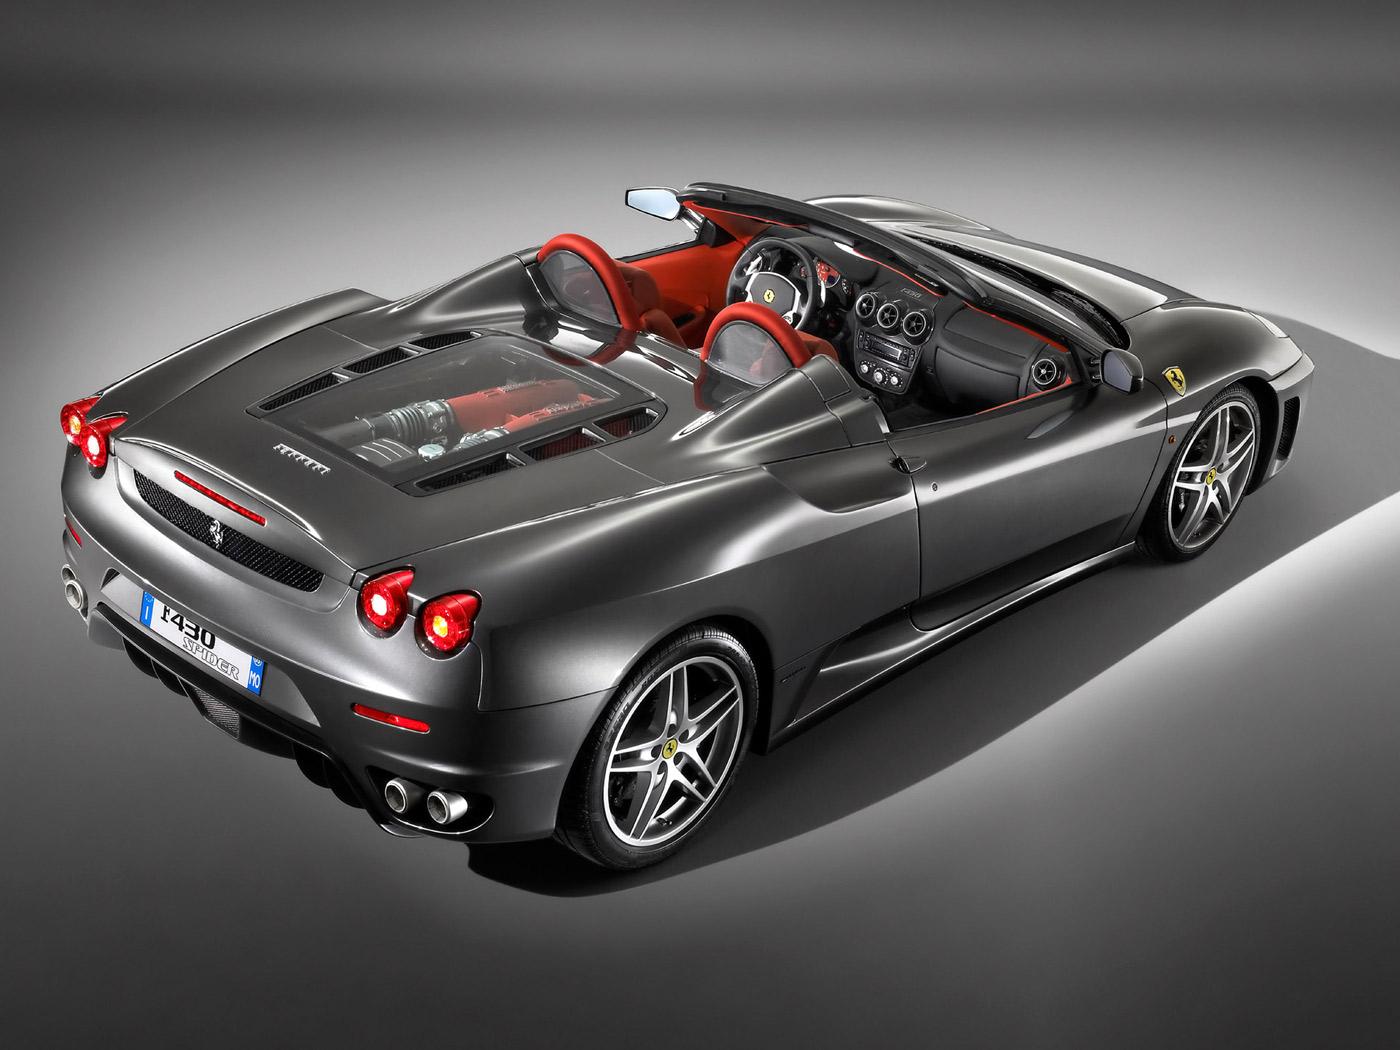 Ferrari Cars Wallpapersferrari Pictures Of Carsferrari Replica Carsnew Carferrari Car Imagesblack